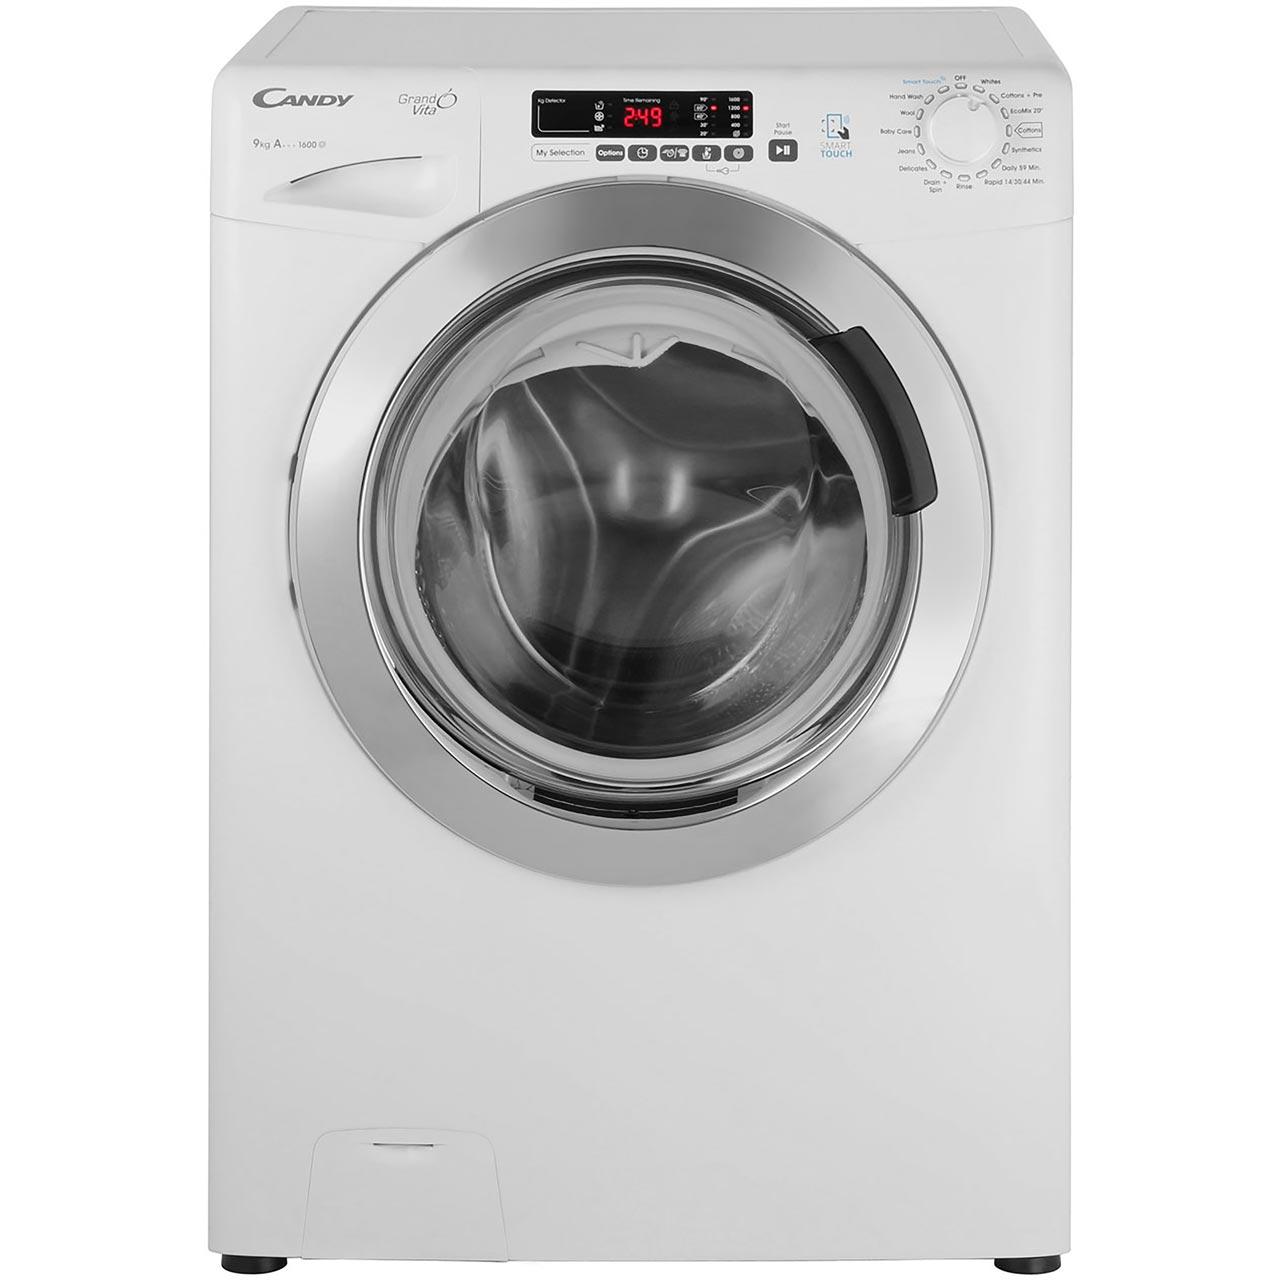 Candy GVS169DC3 Grand'O Vita A+++ 9Kg 1600RPM - £223.20 or Candy CBWM814DC A+++ 8Kg 1400 RPM Washing Machine - £229.68 delivered @ AO eBay